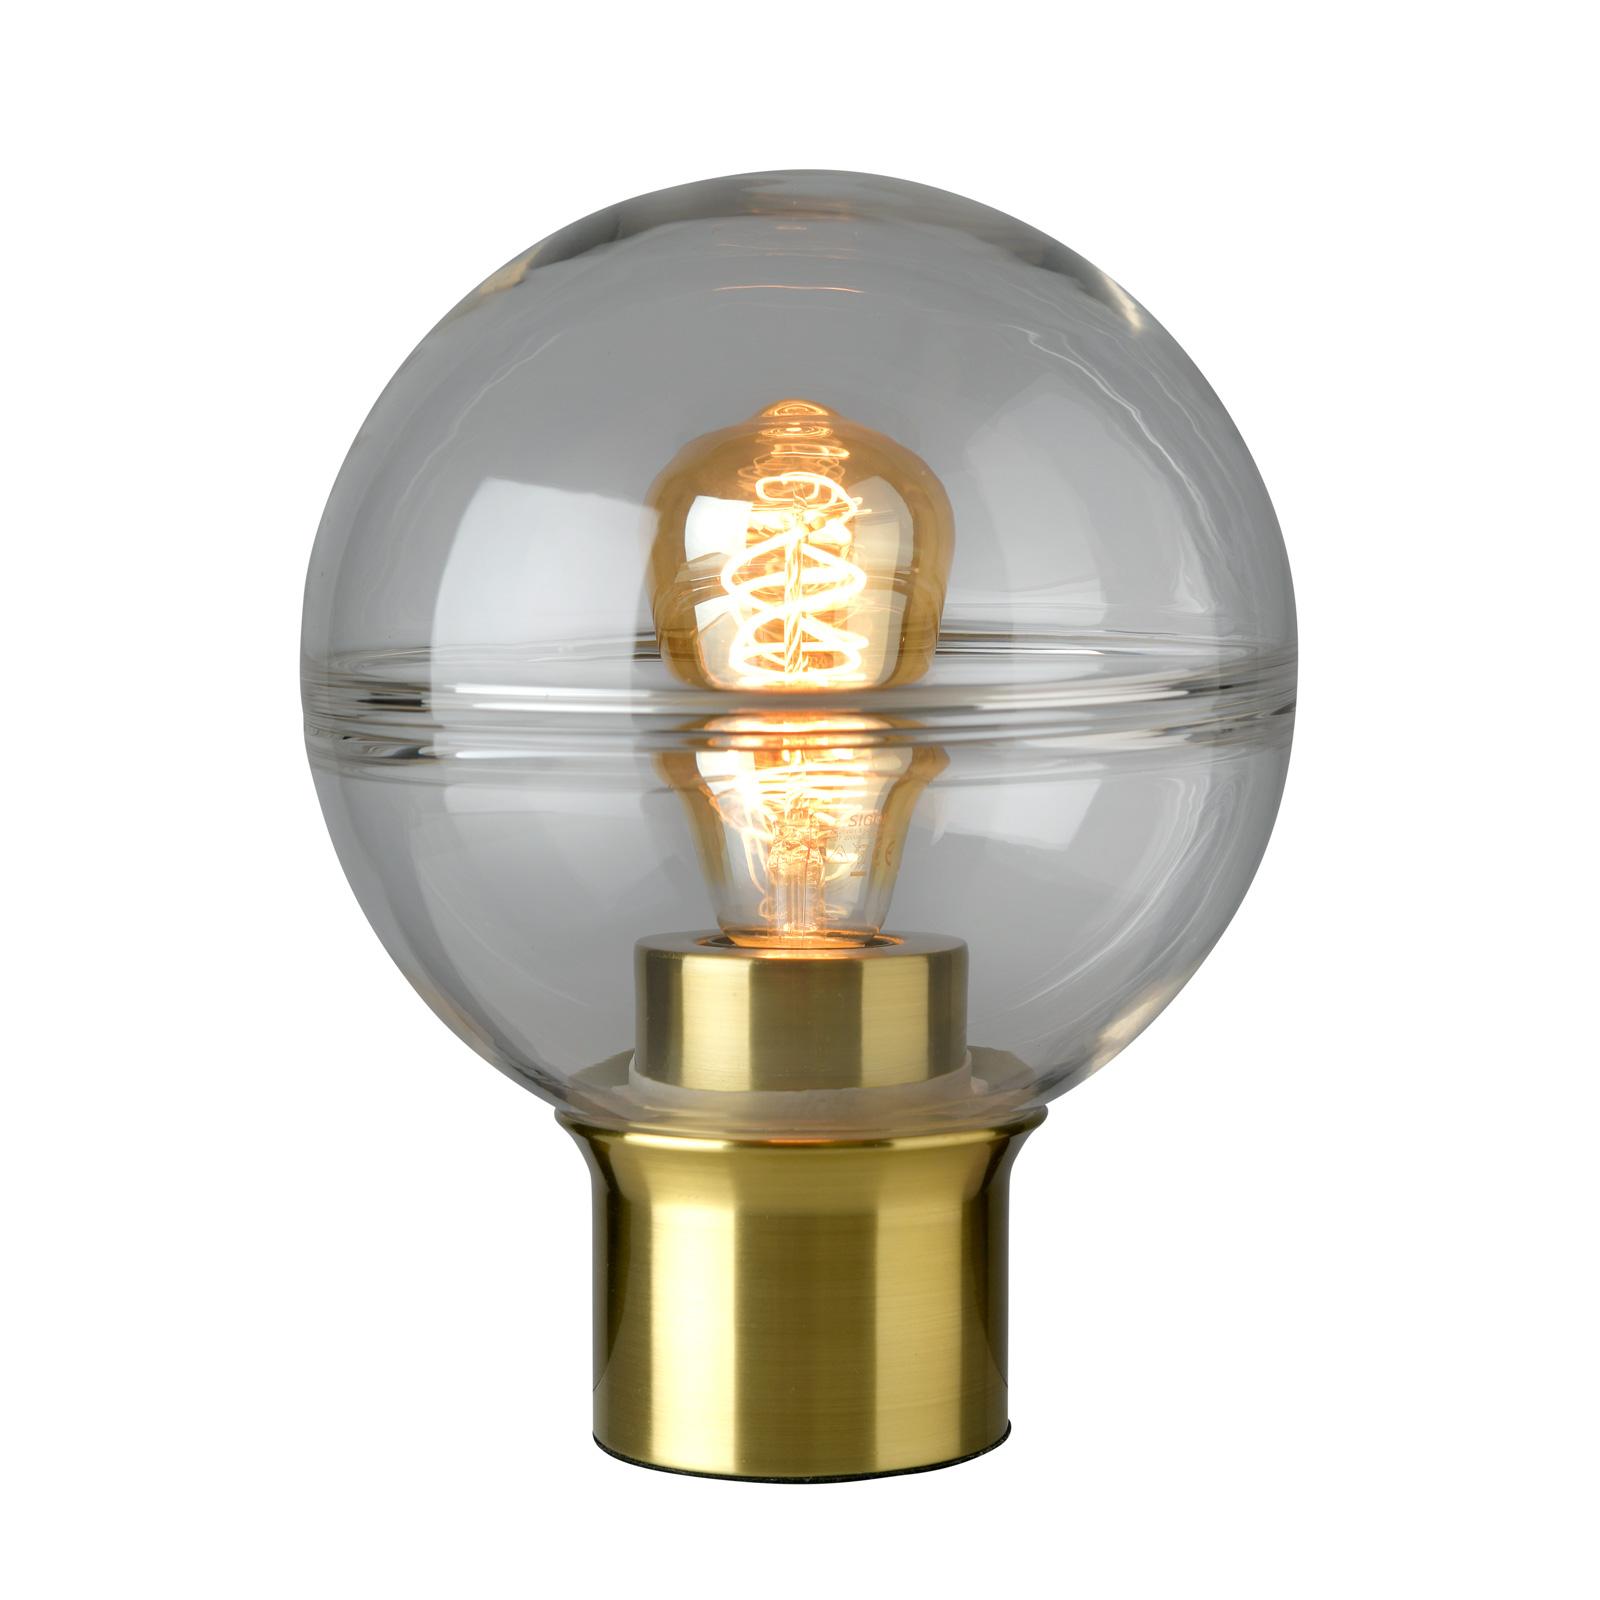 Villeroy & Boch Tokio tafellamp, goud Ø 20 cm